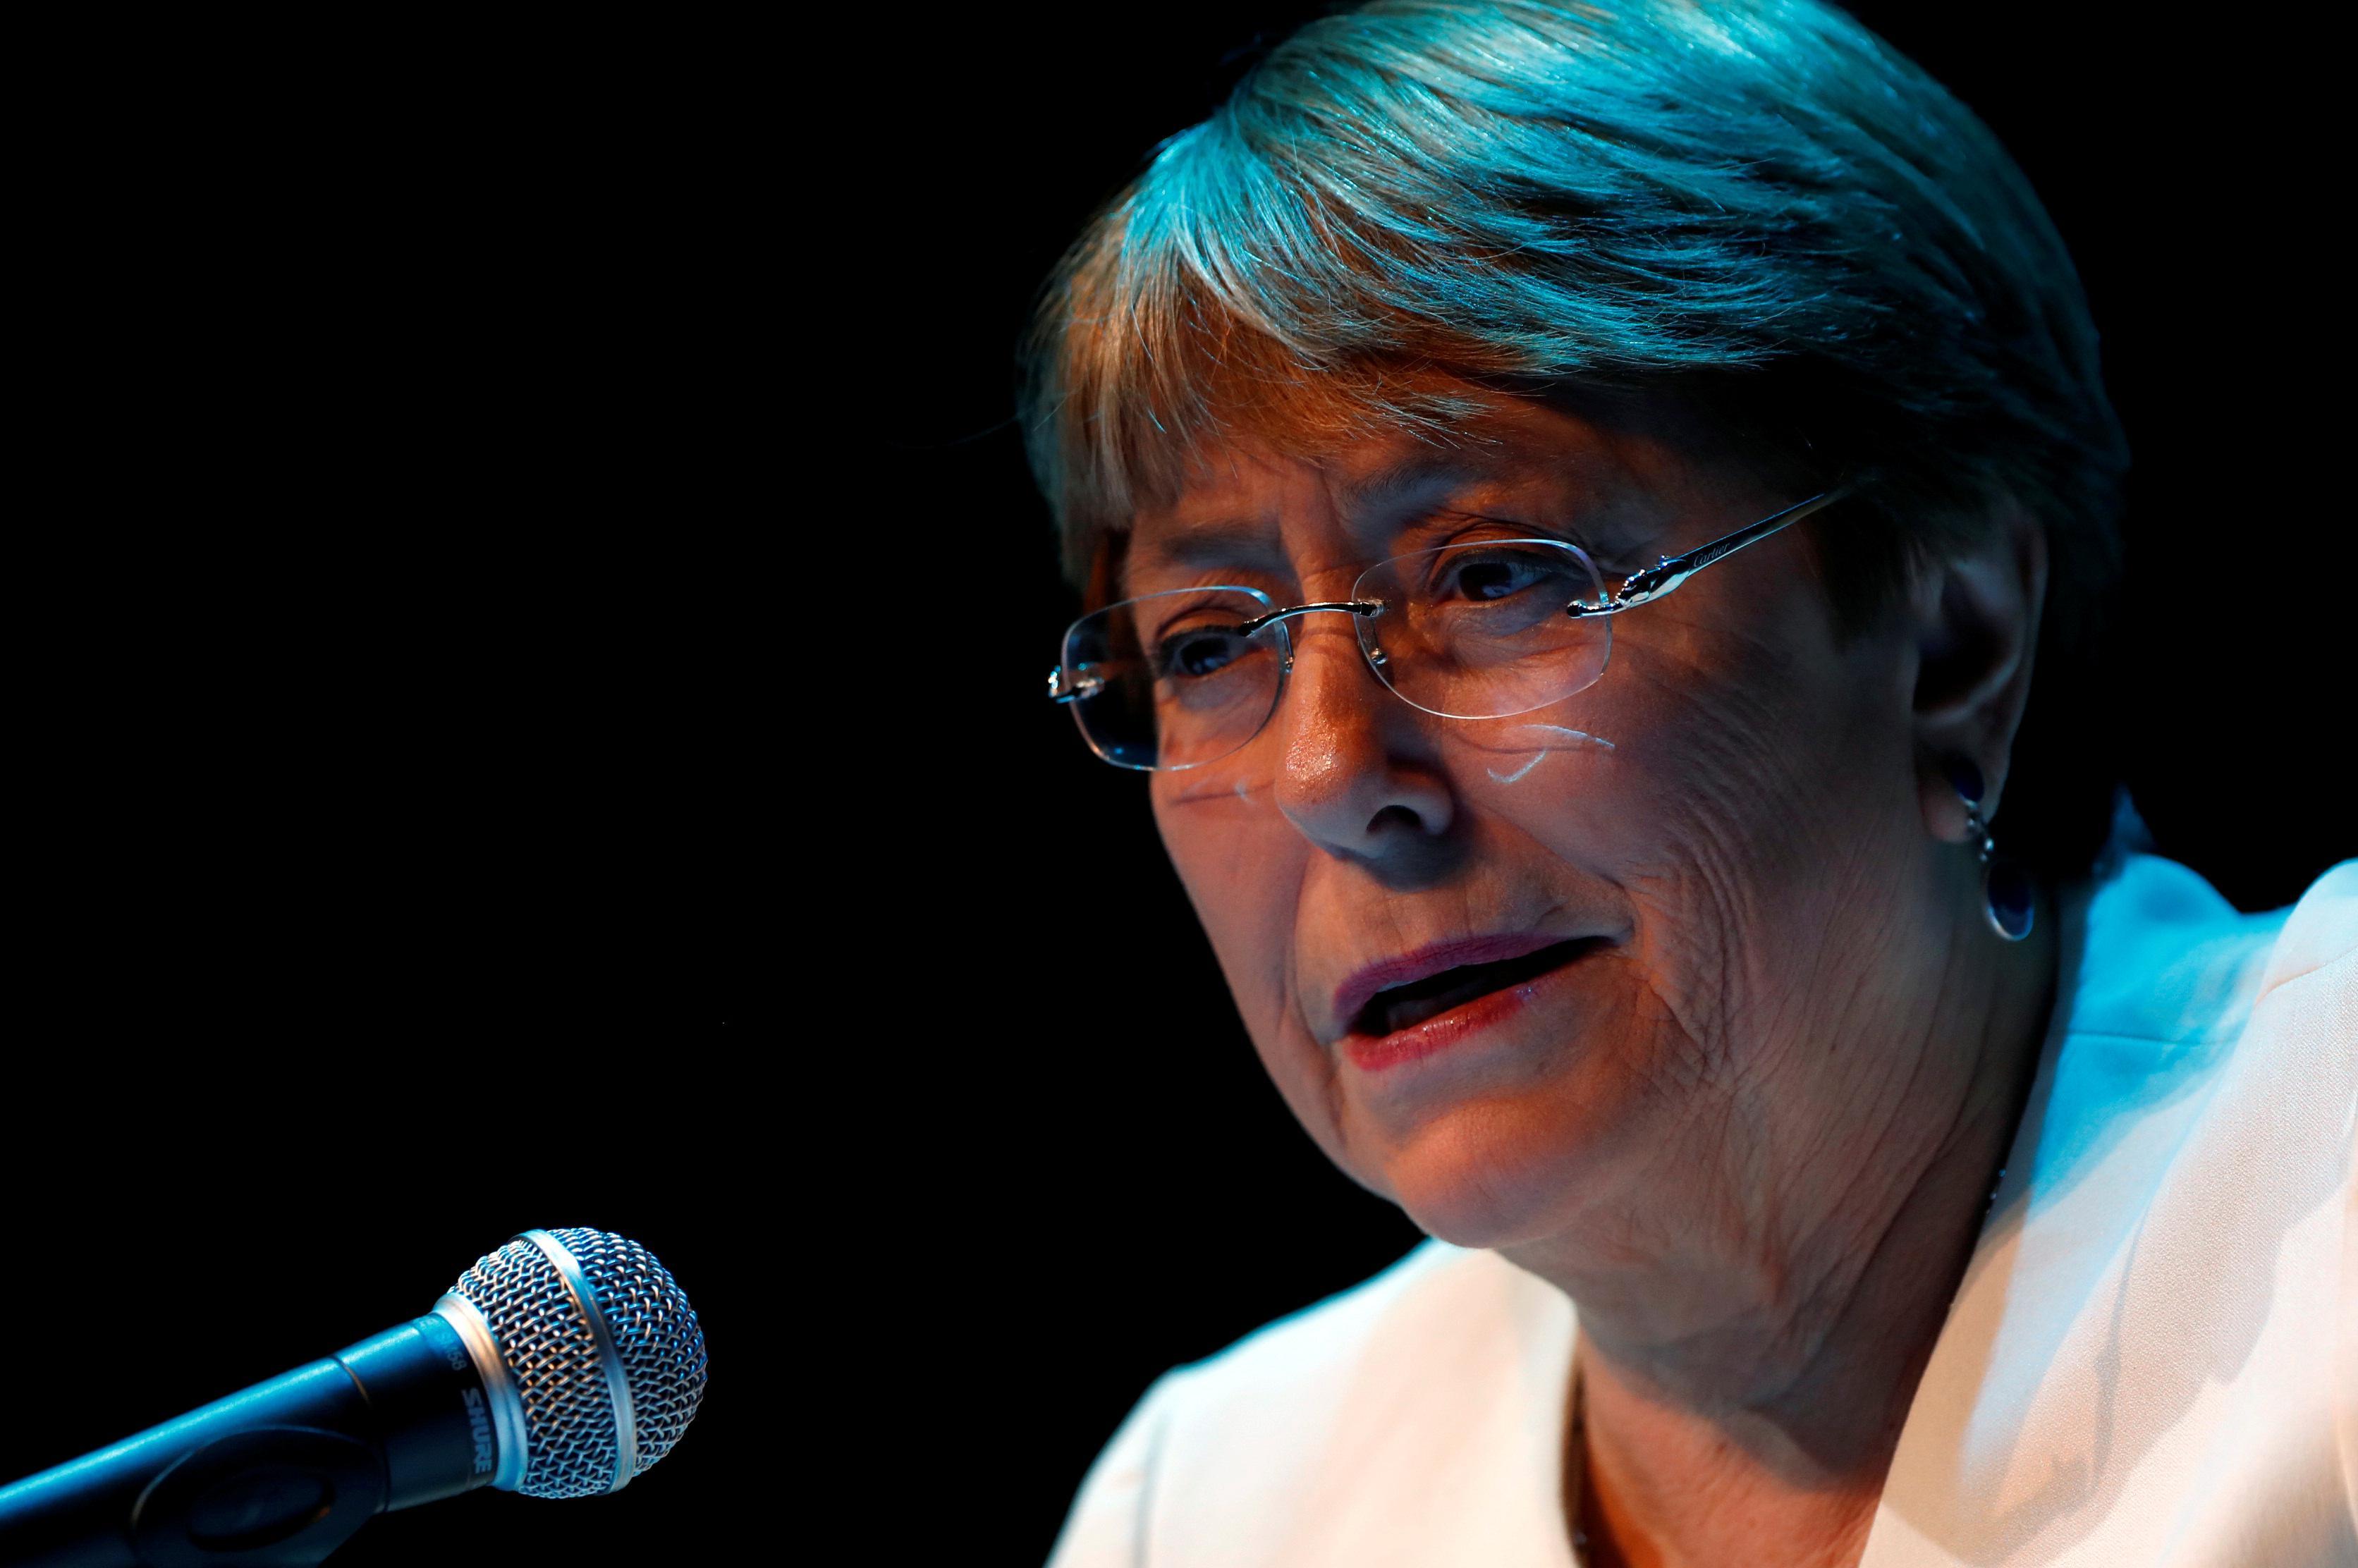 U.N.'s Bachelet says Congresswomen opposing Trump are 'fantastic'